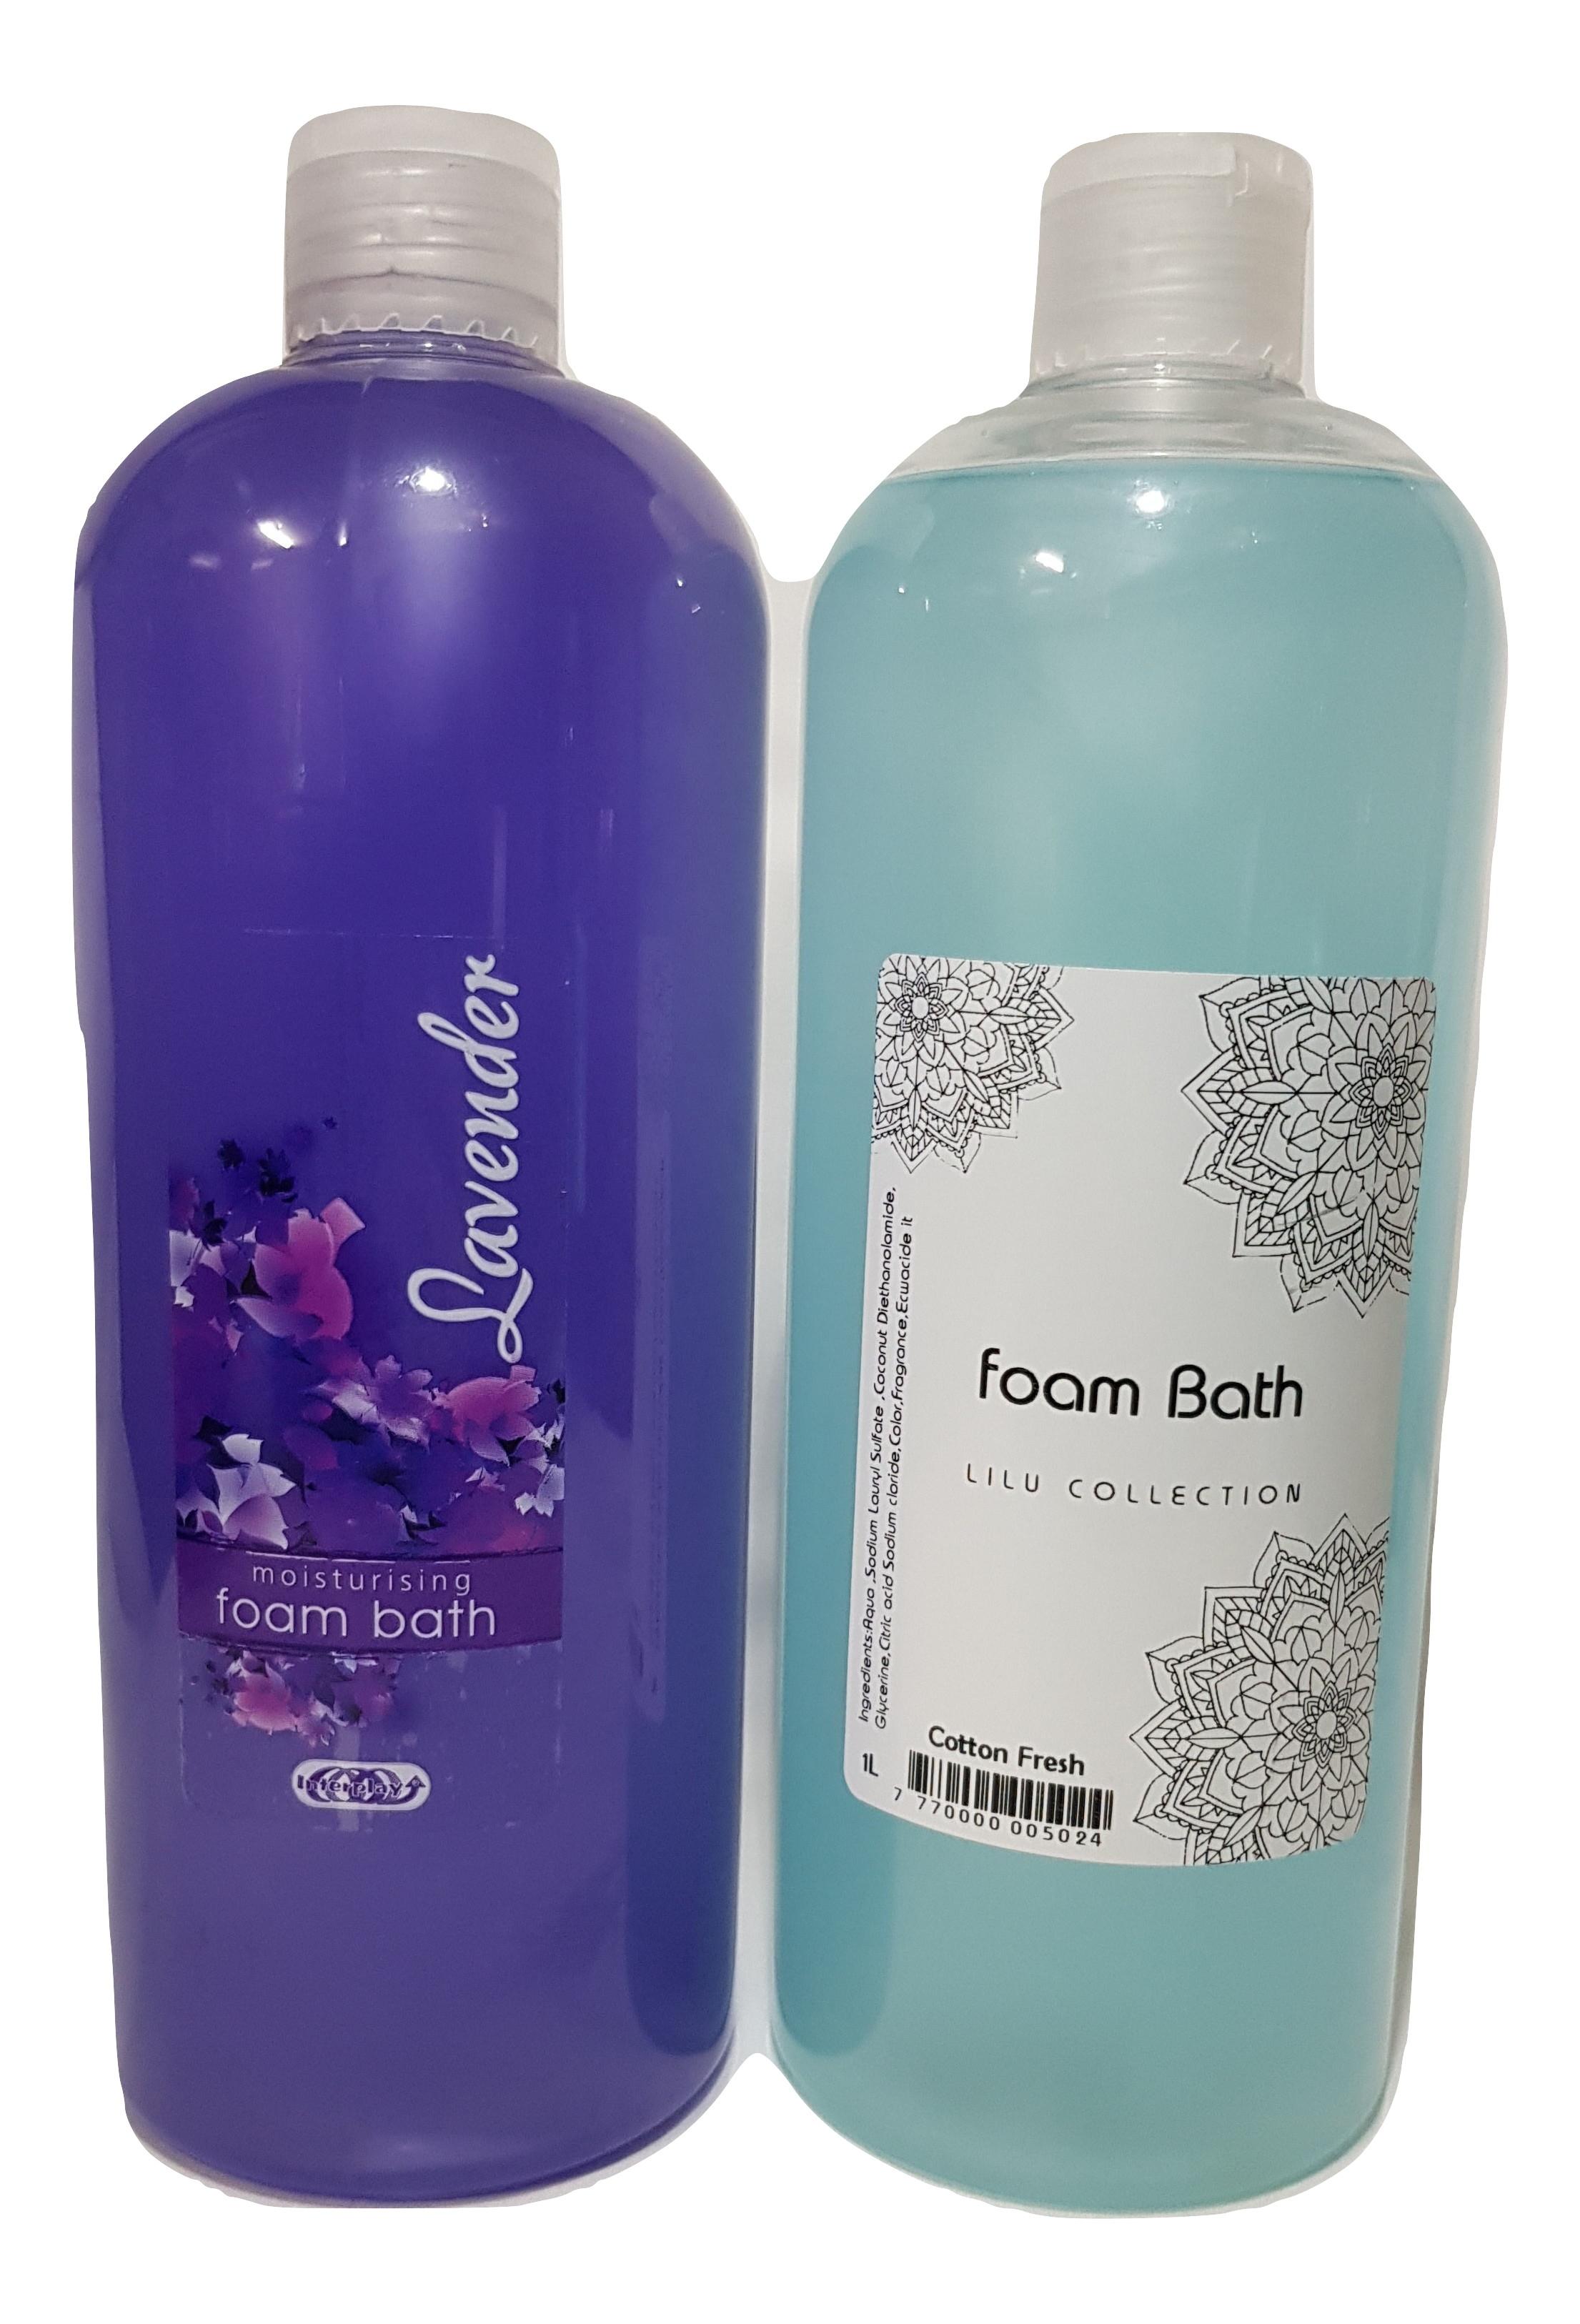 foam-bath-bubble-bath